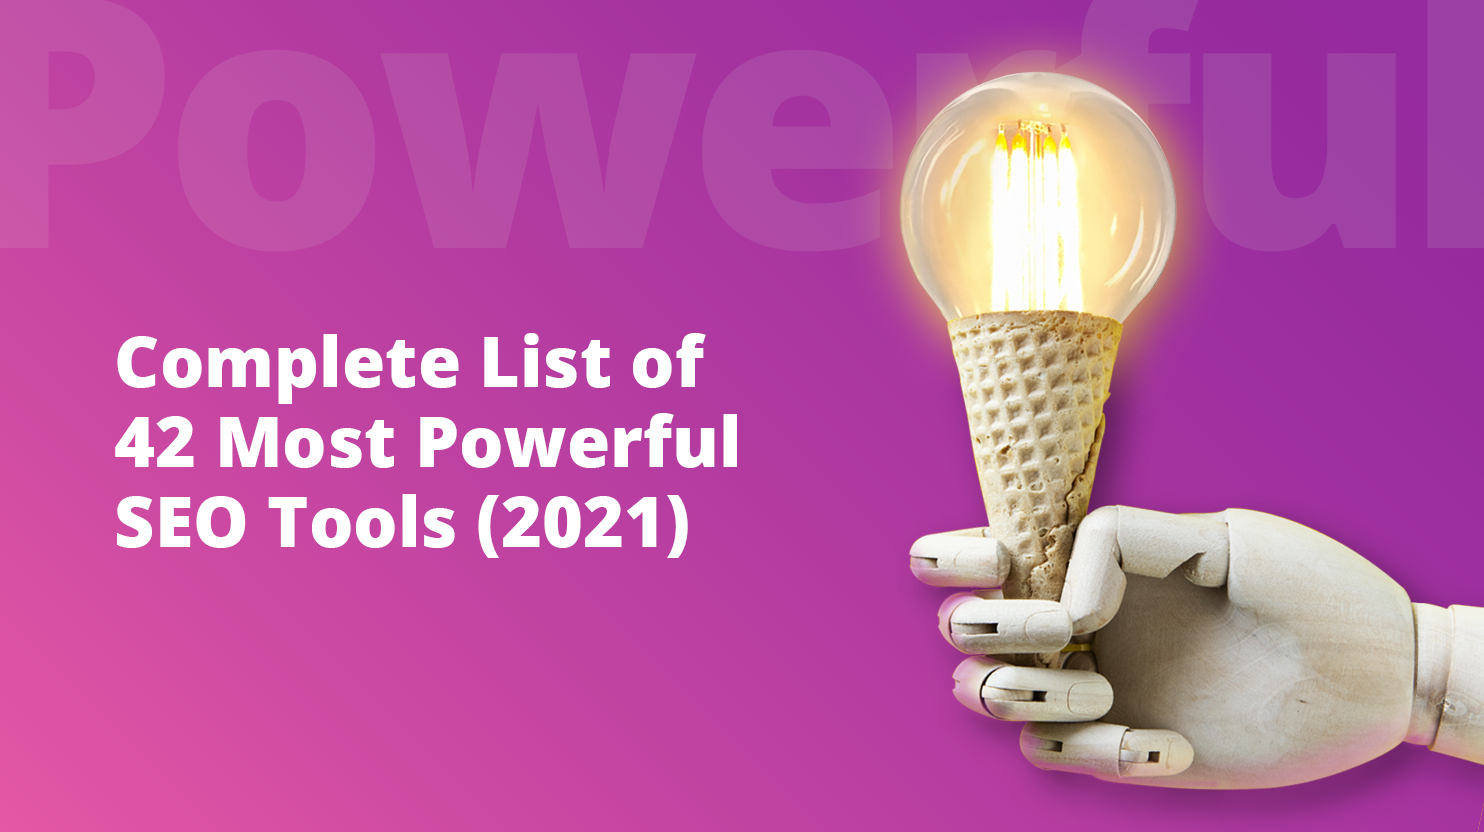 Comlete list of 42+ SEO tools